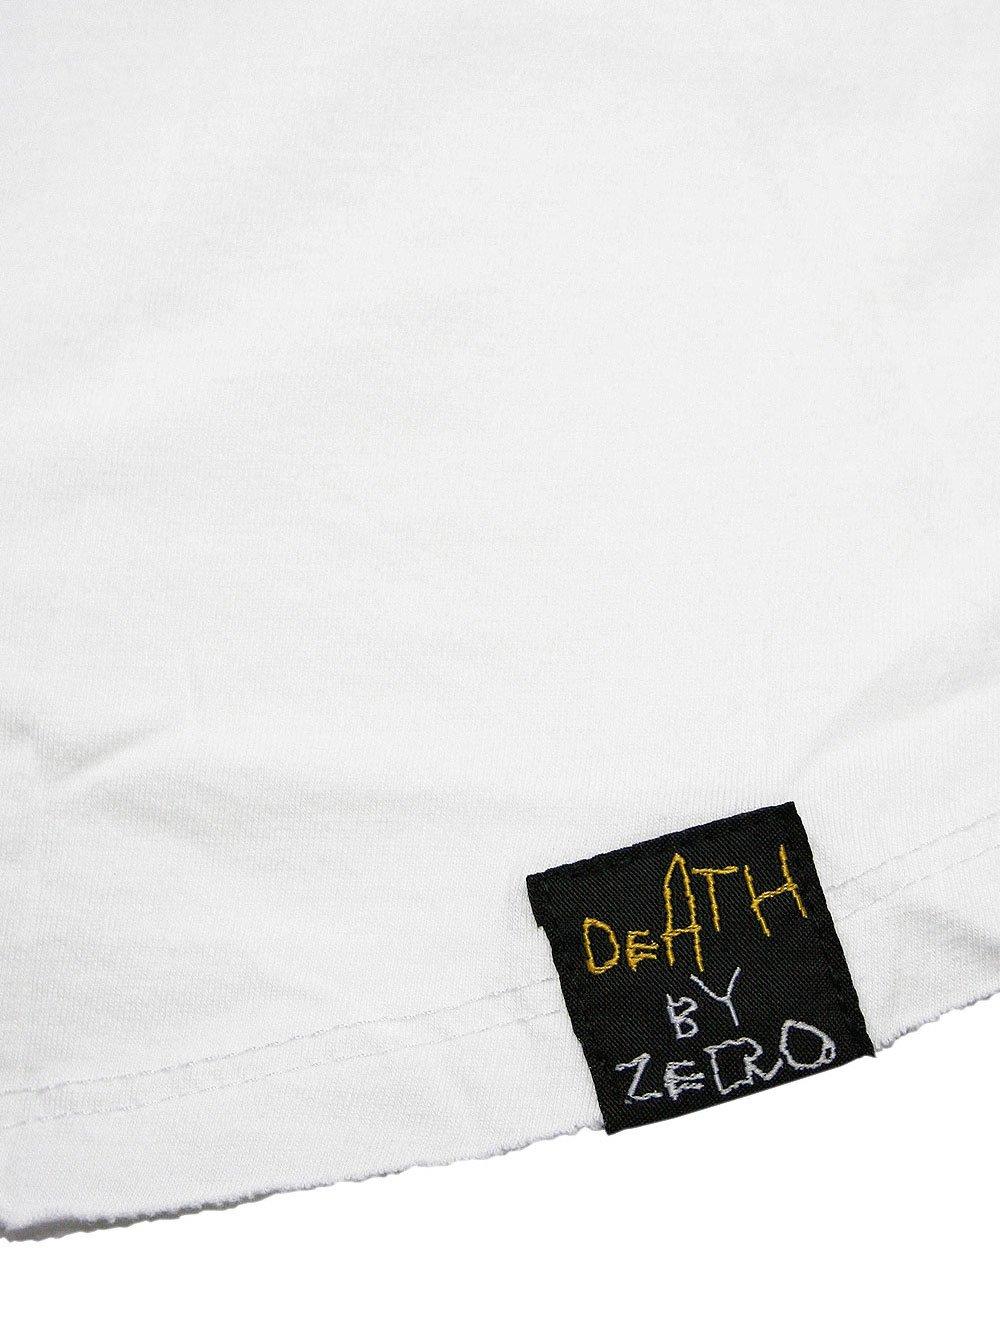 Herren Top Chasing Paradise (weiß) - Death By Zero 10979 - Tank ... 33d8f36d77